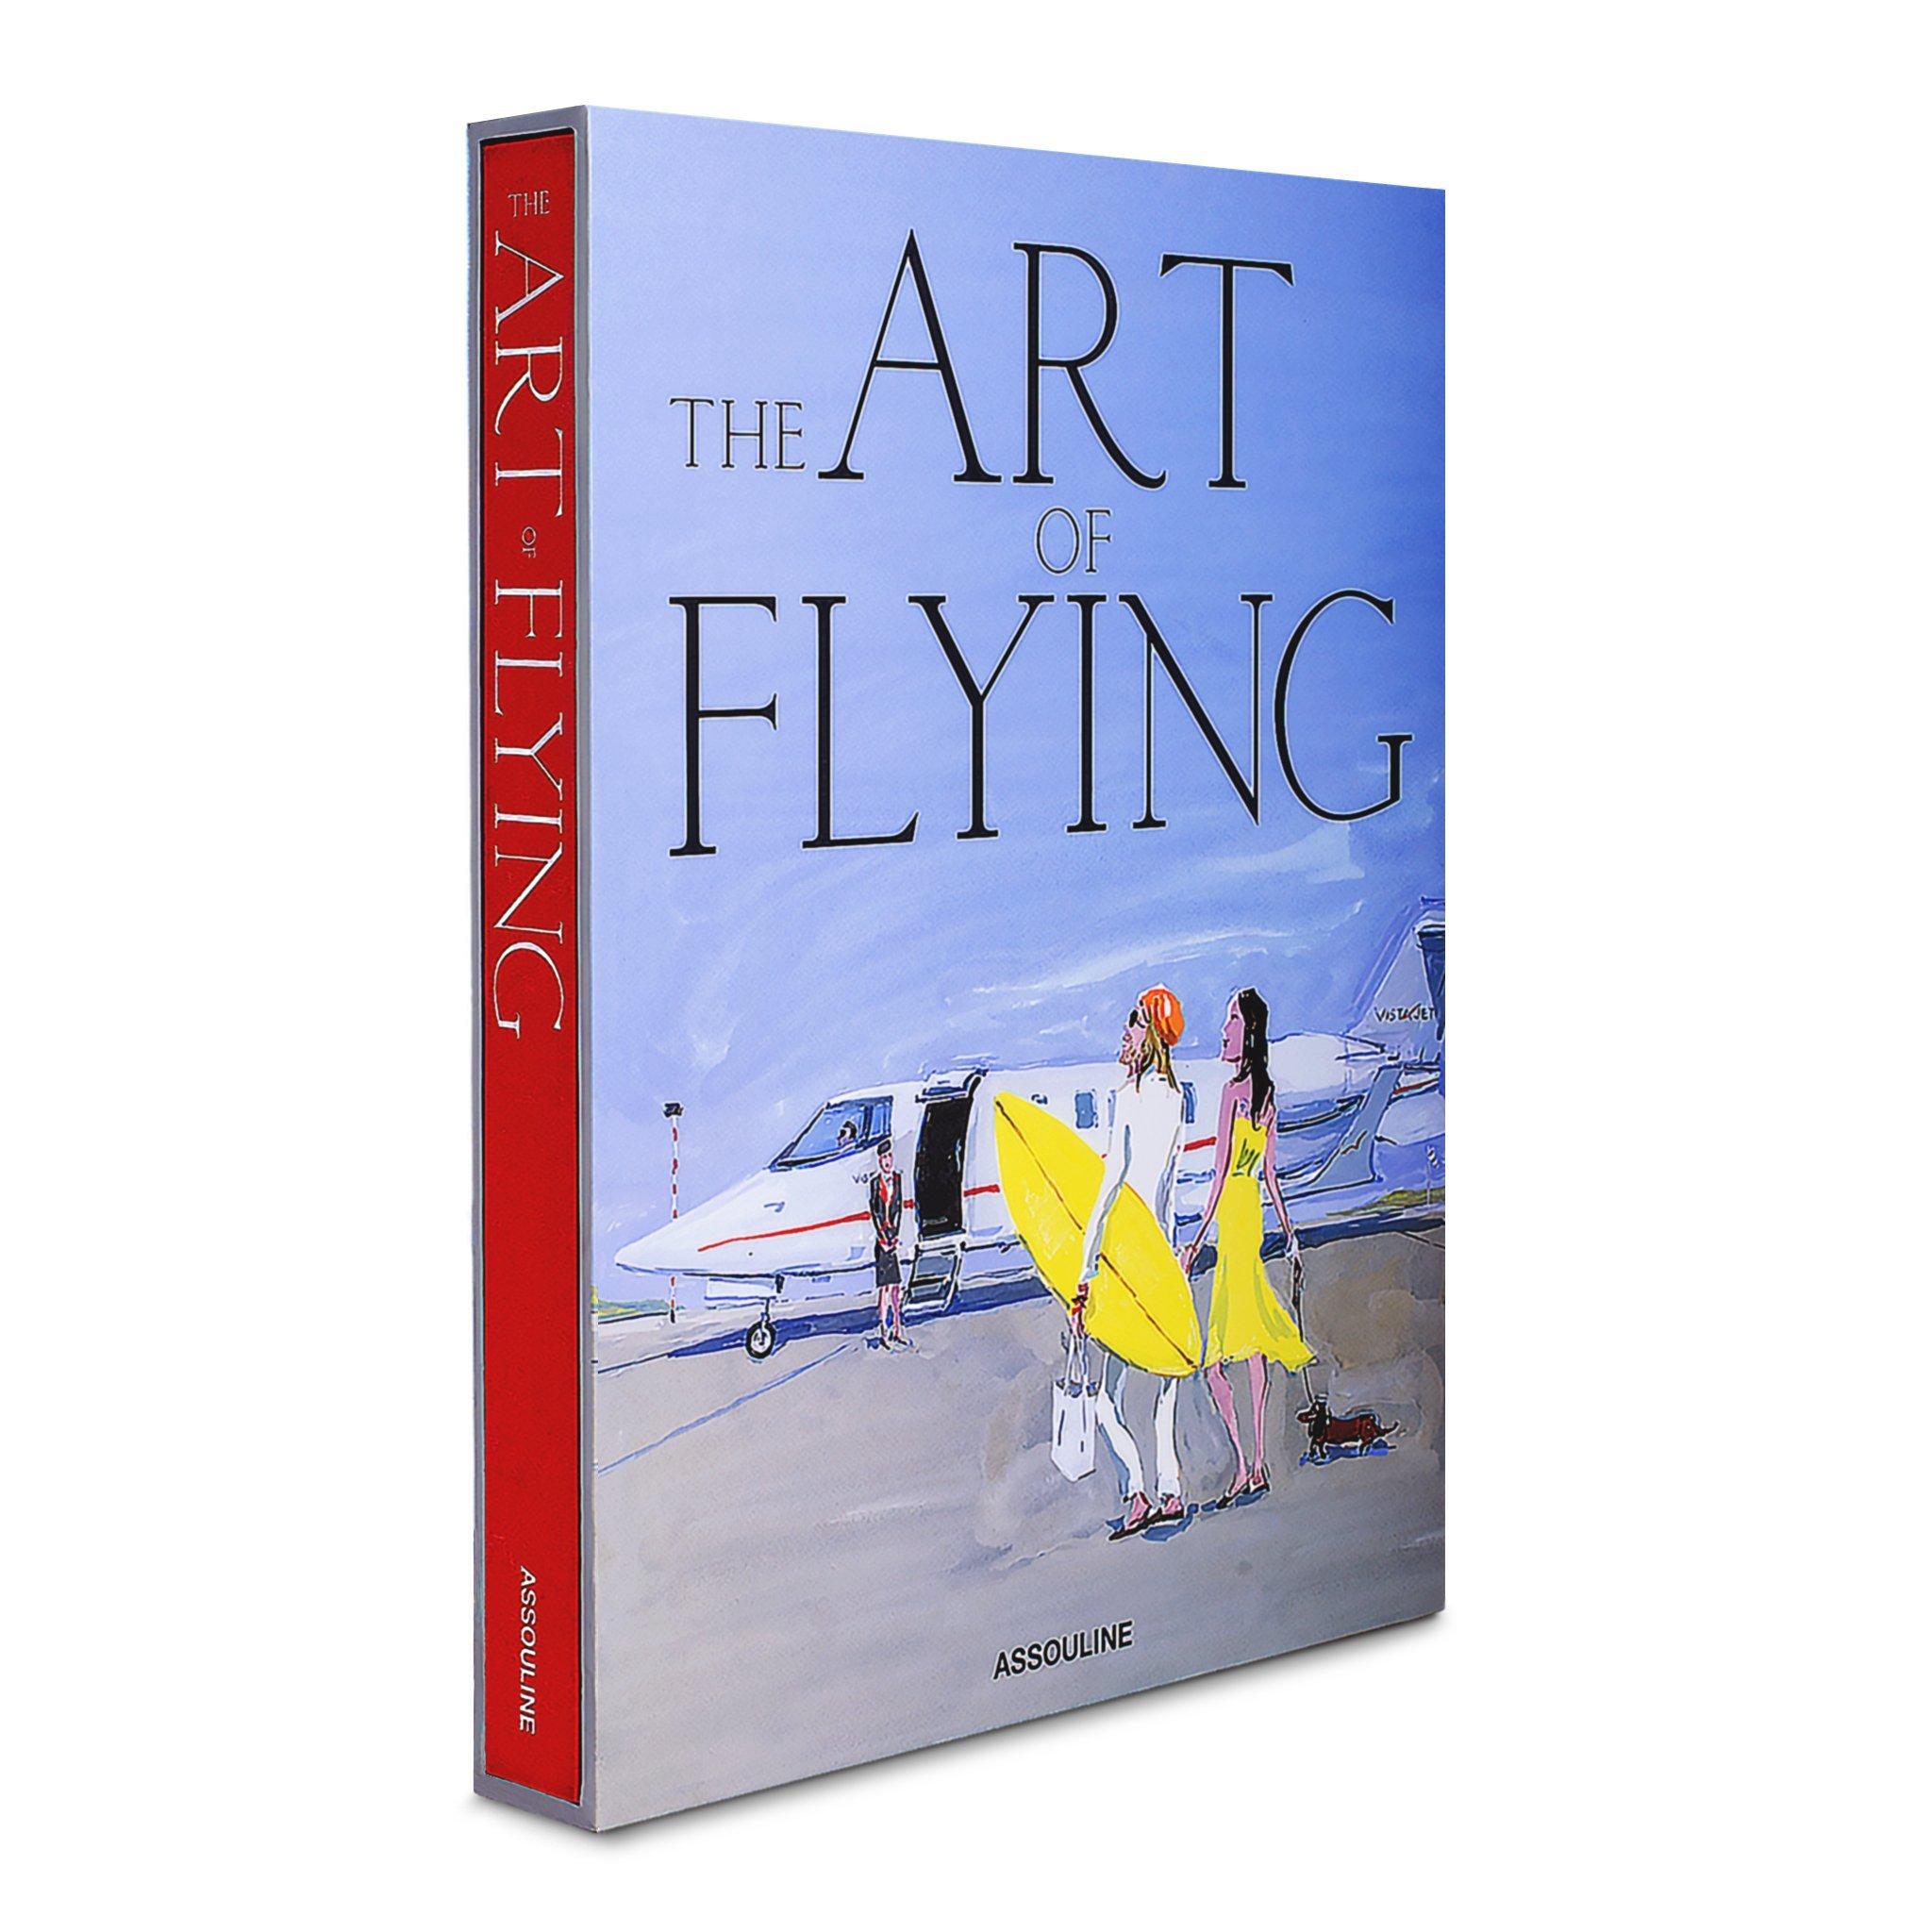 The Art of Flying © Assouline